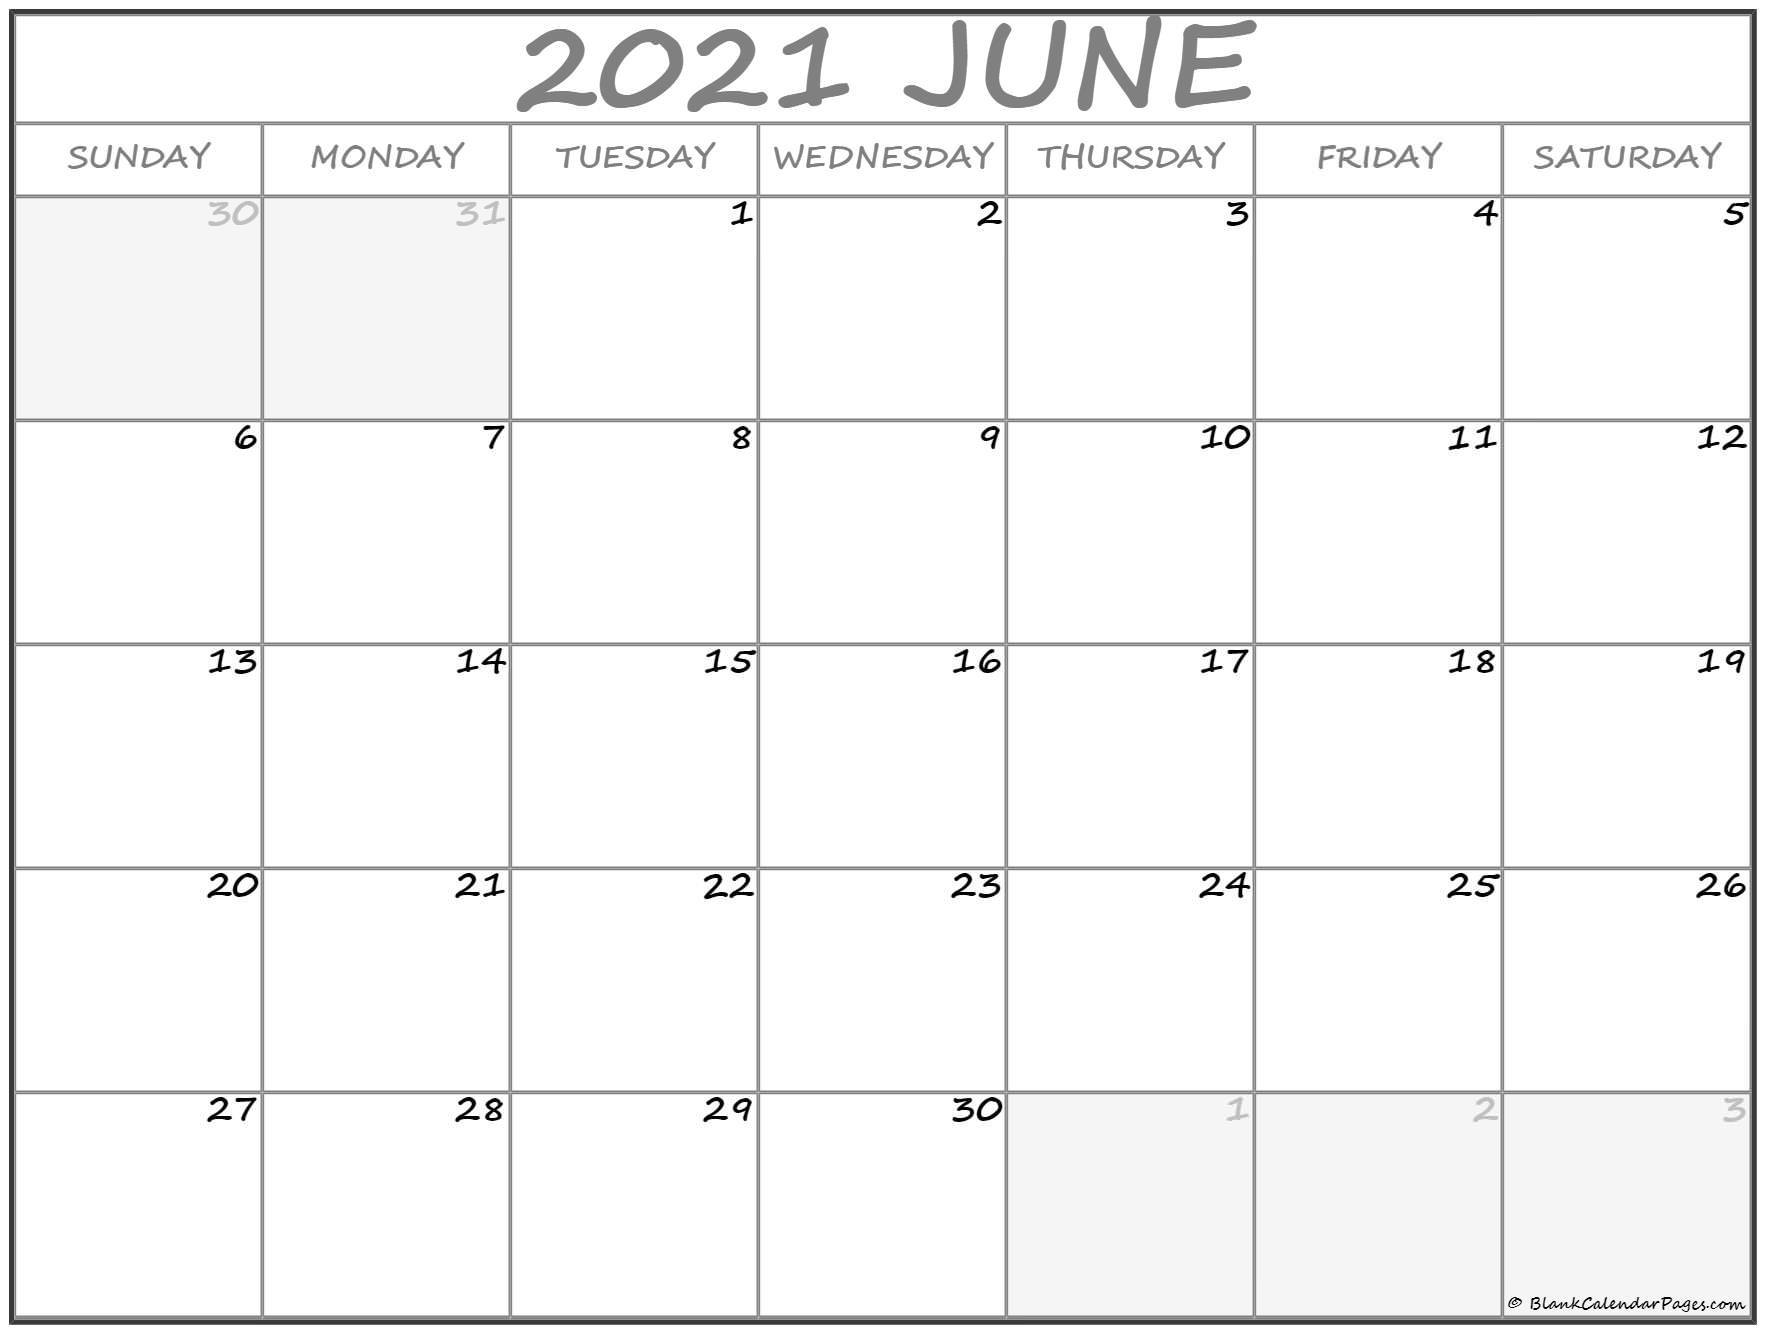 June 2021 Calendar | Free Printable Monthly Calendars  Monthly Calendar 2021